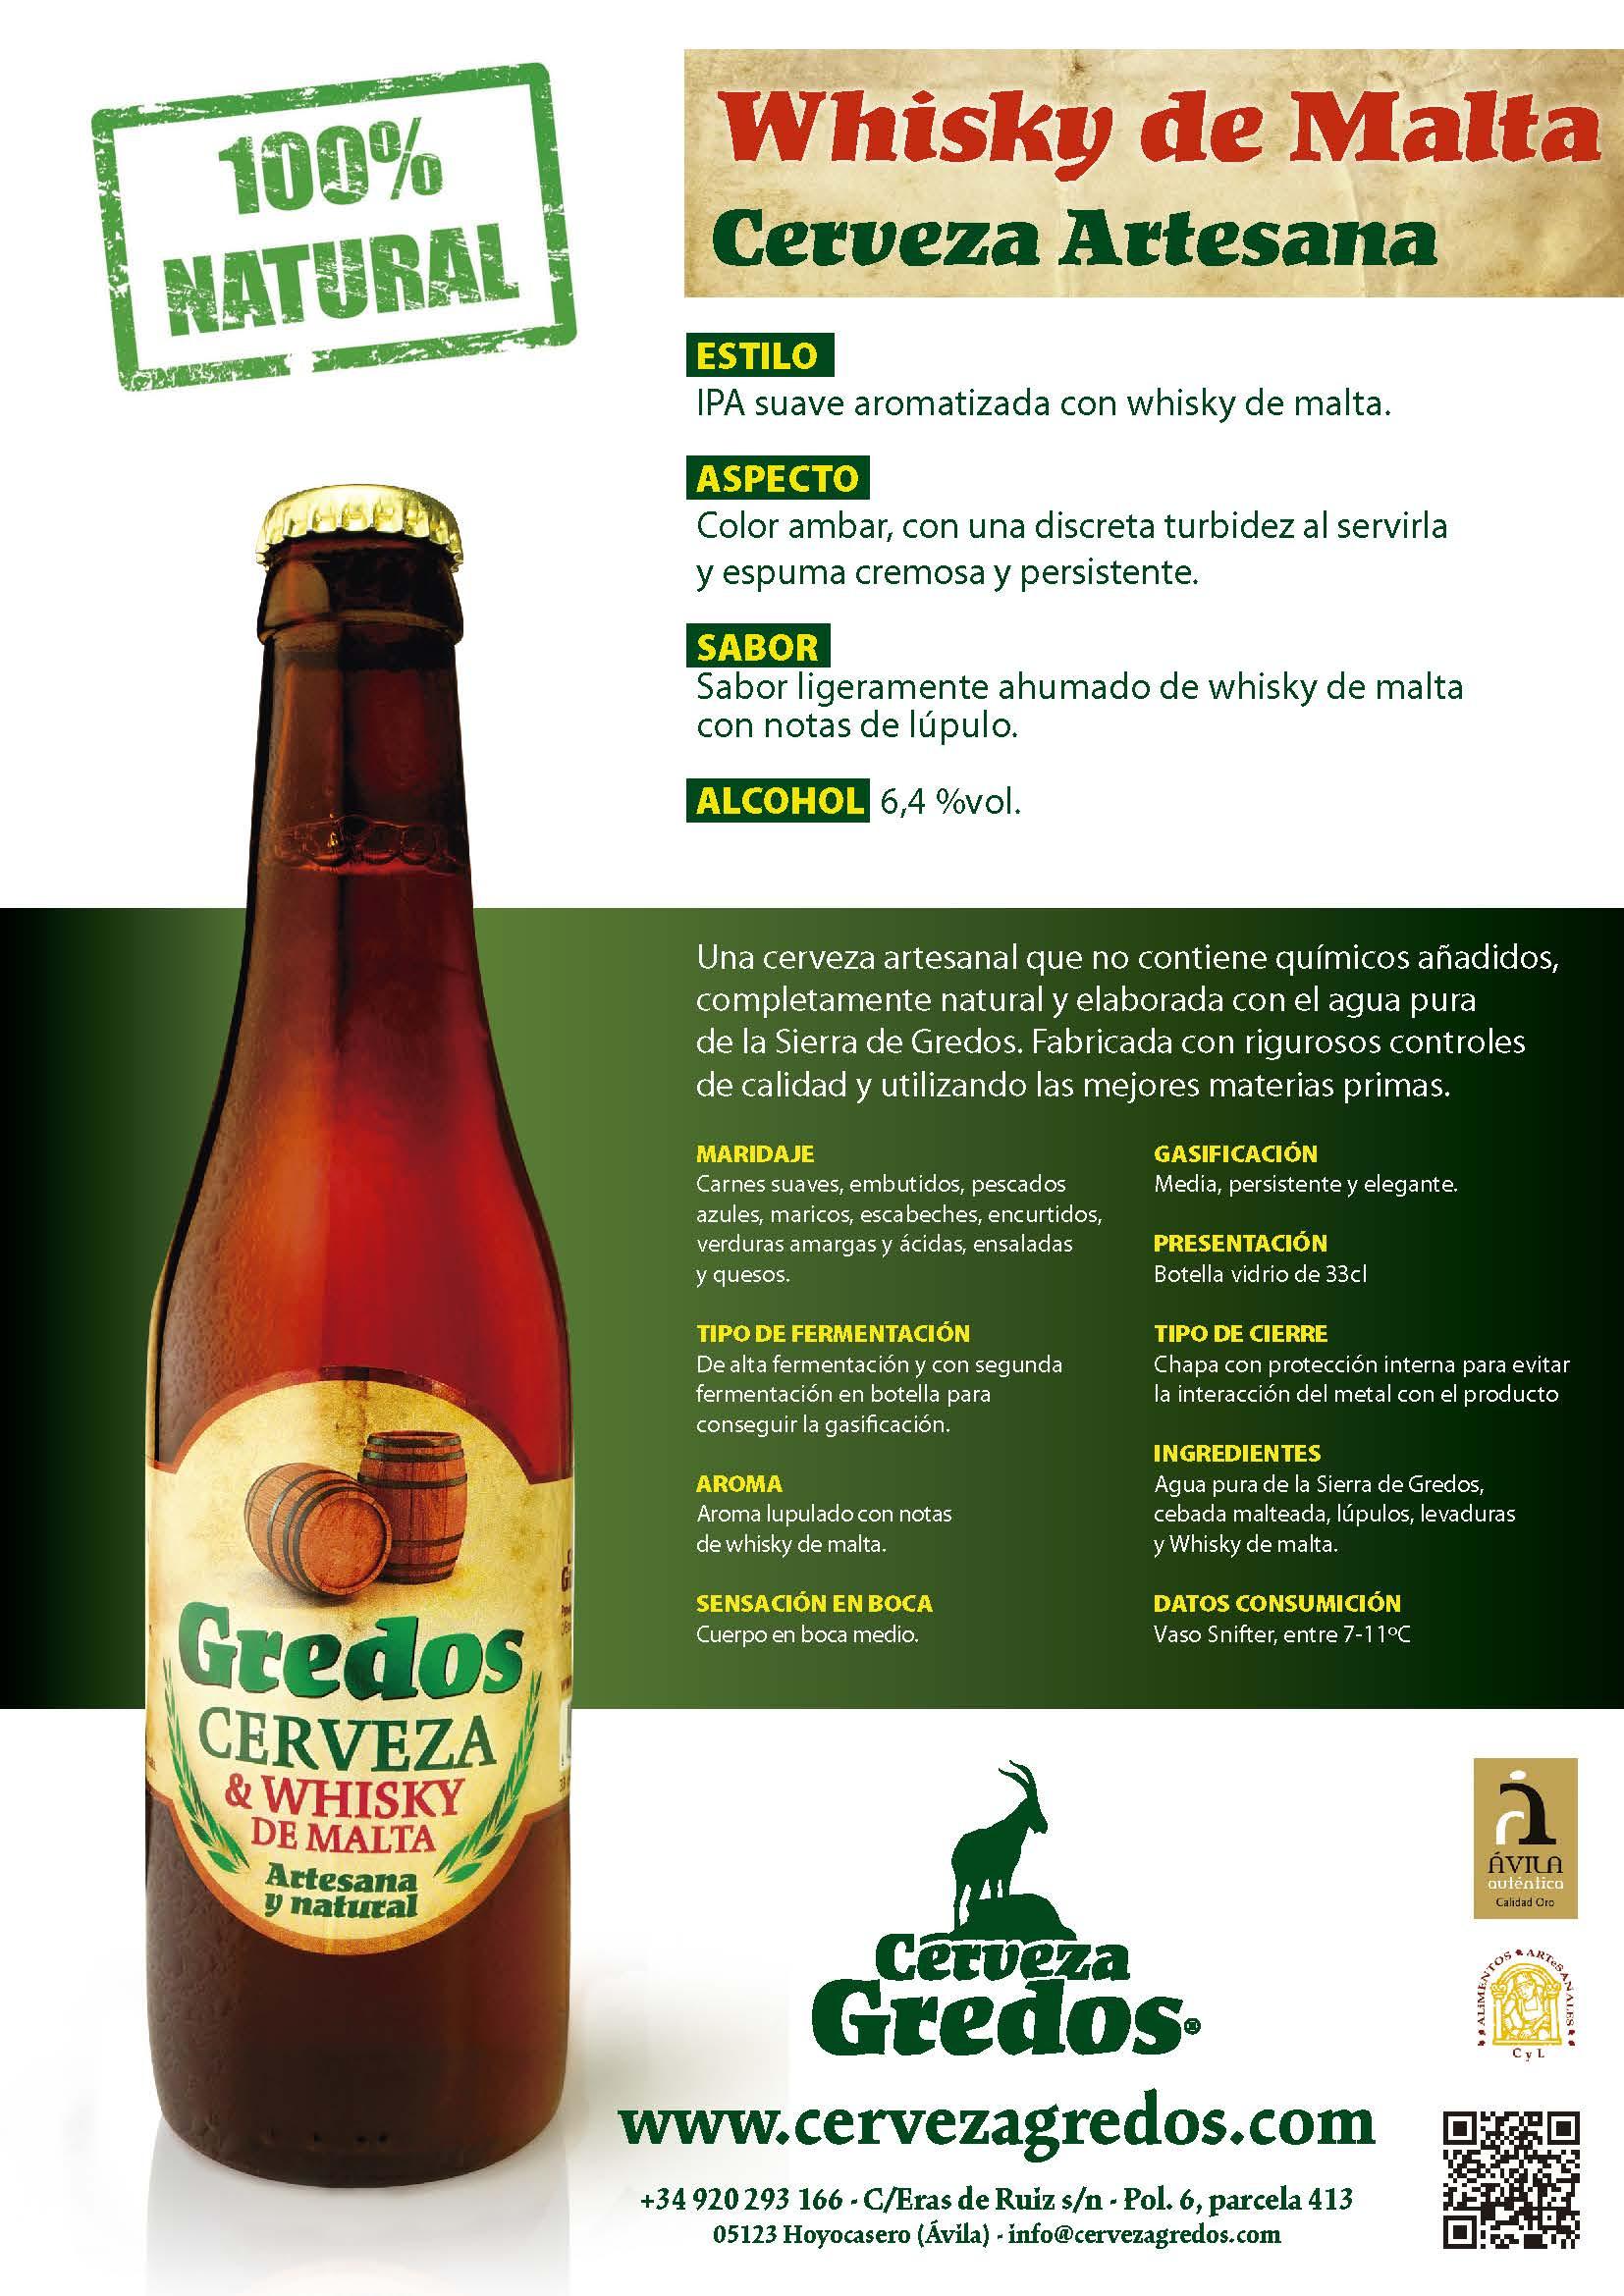 Cerveza artesana con whisky alta graduación